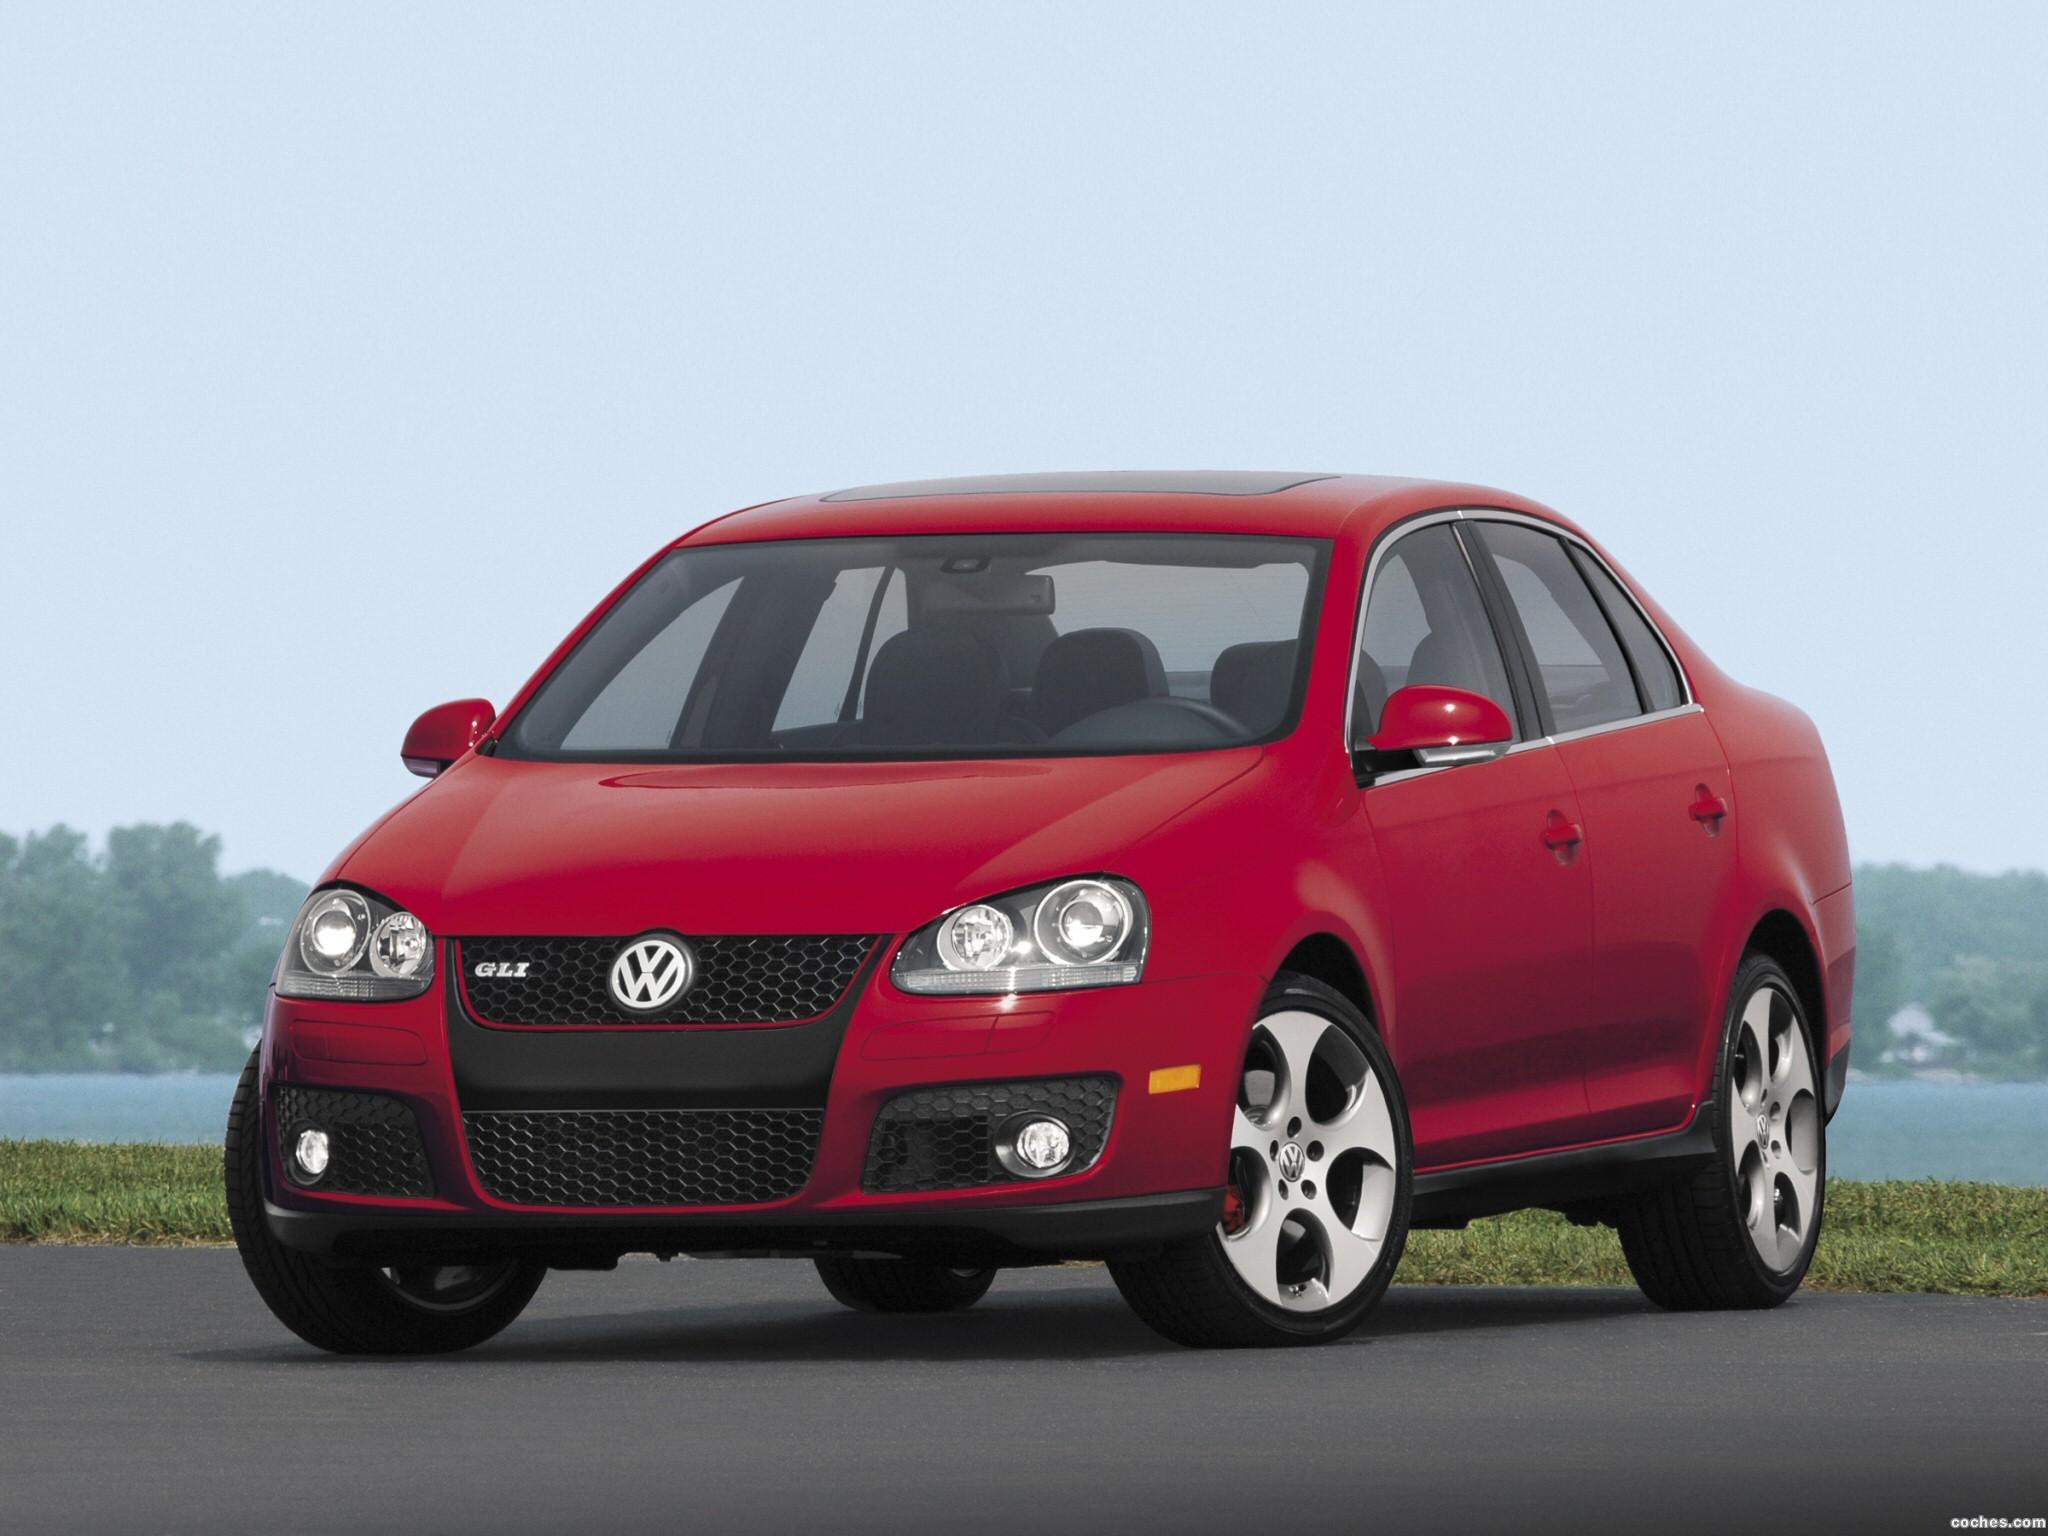 Volkswagen GLI 2006 - 2011